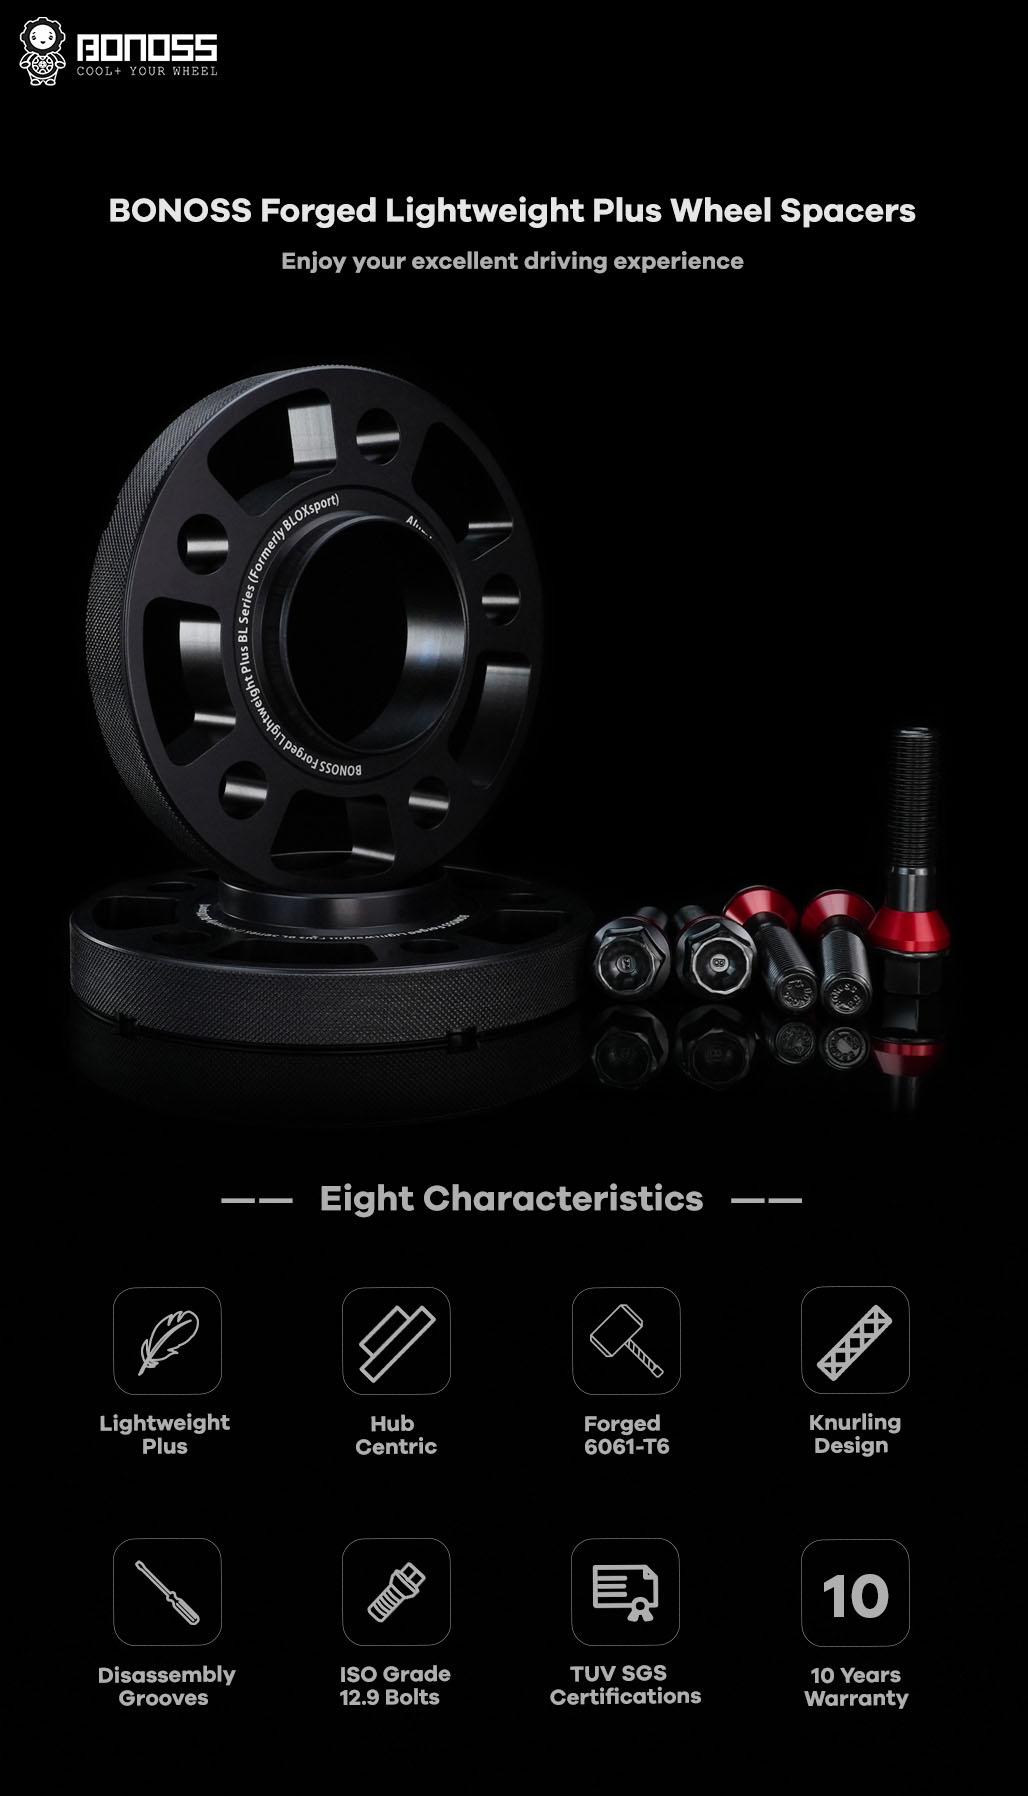 AL6061-T6 BONOSS forged lightweight plus wheel spacers 5x112 66.5 14x1.25 cone seat-by lulu-1